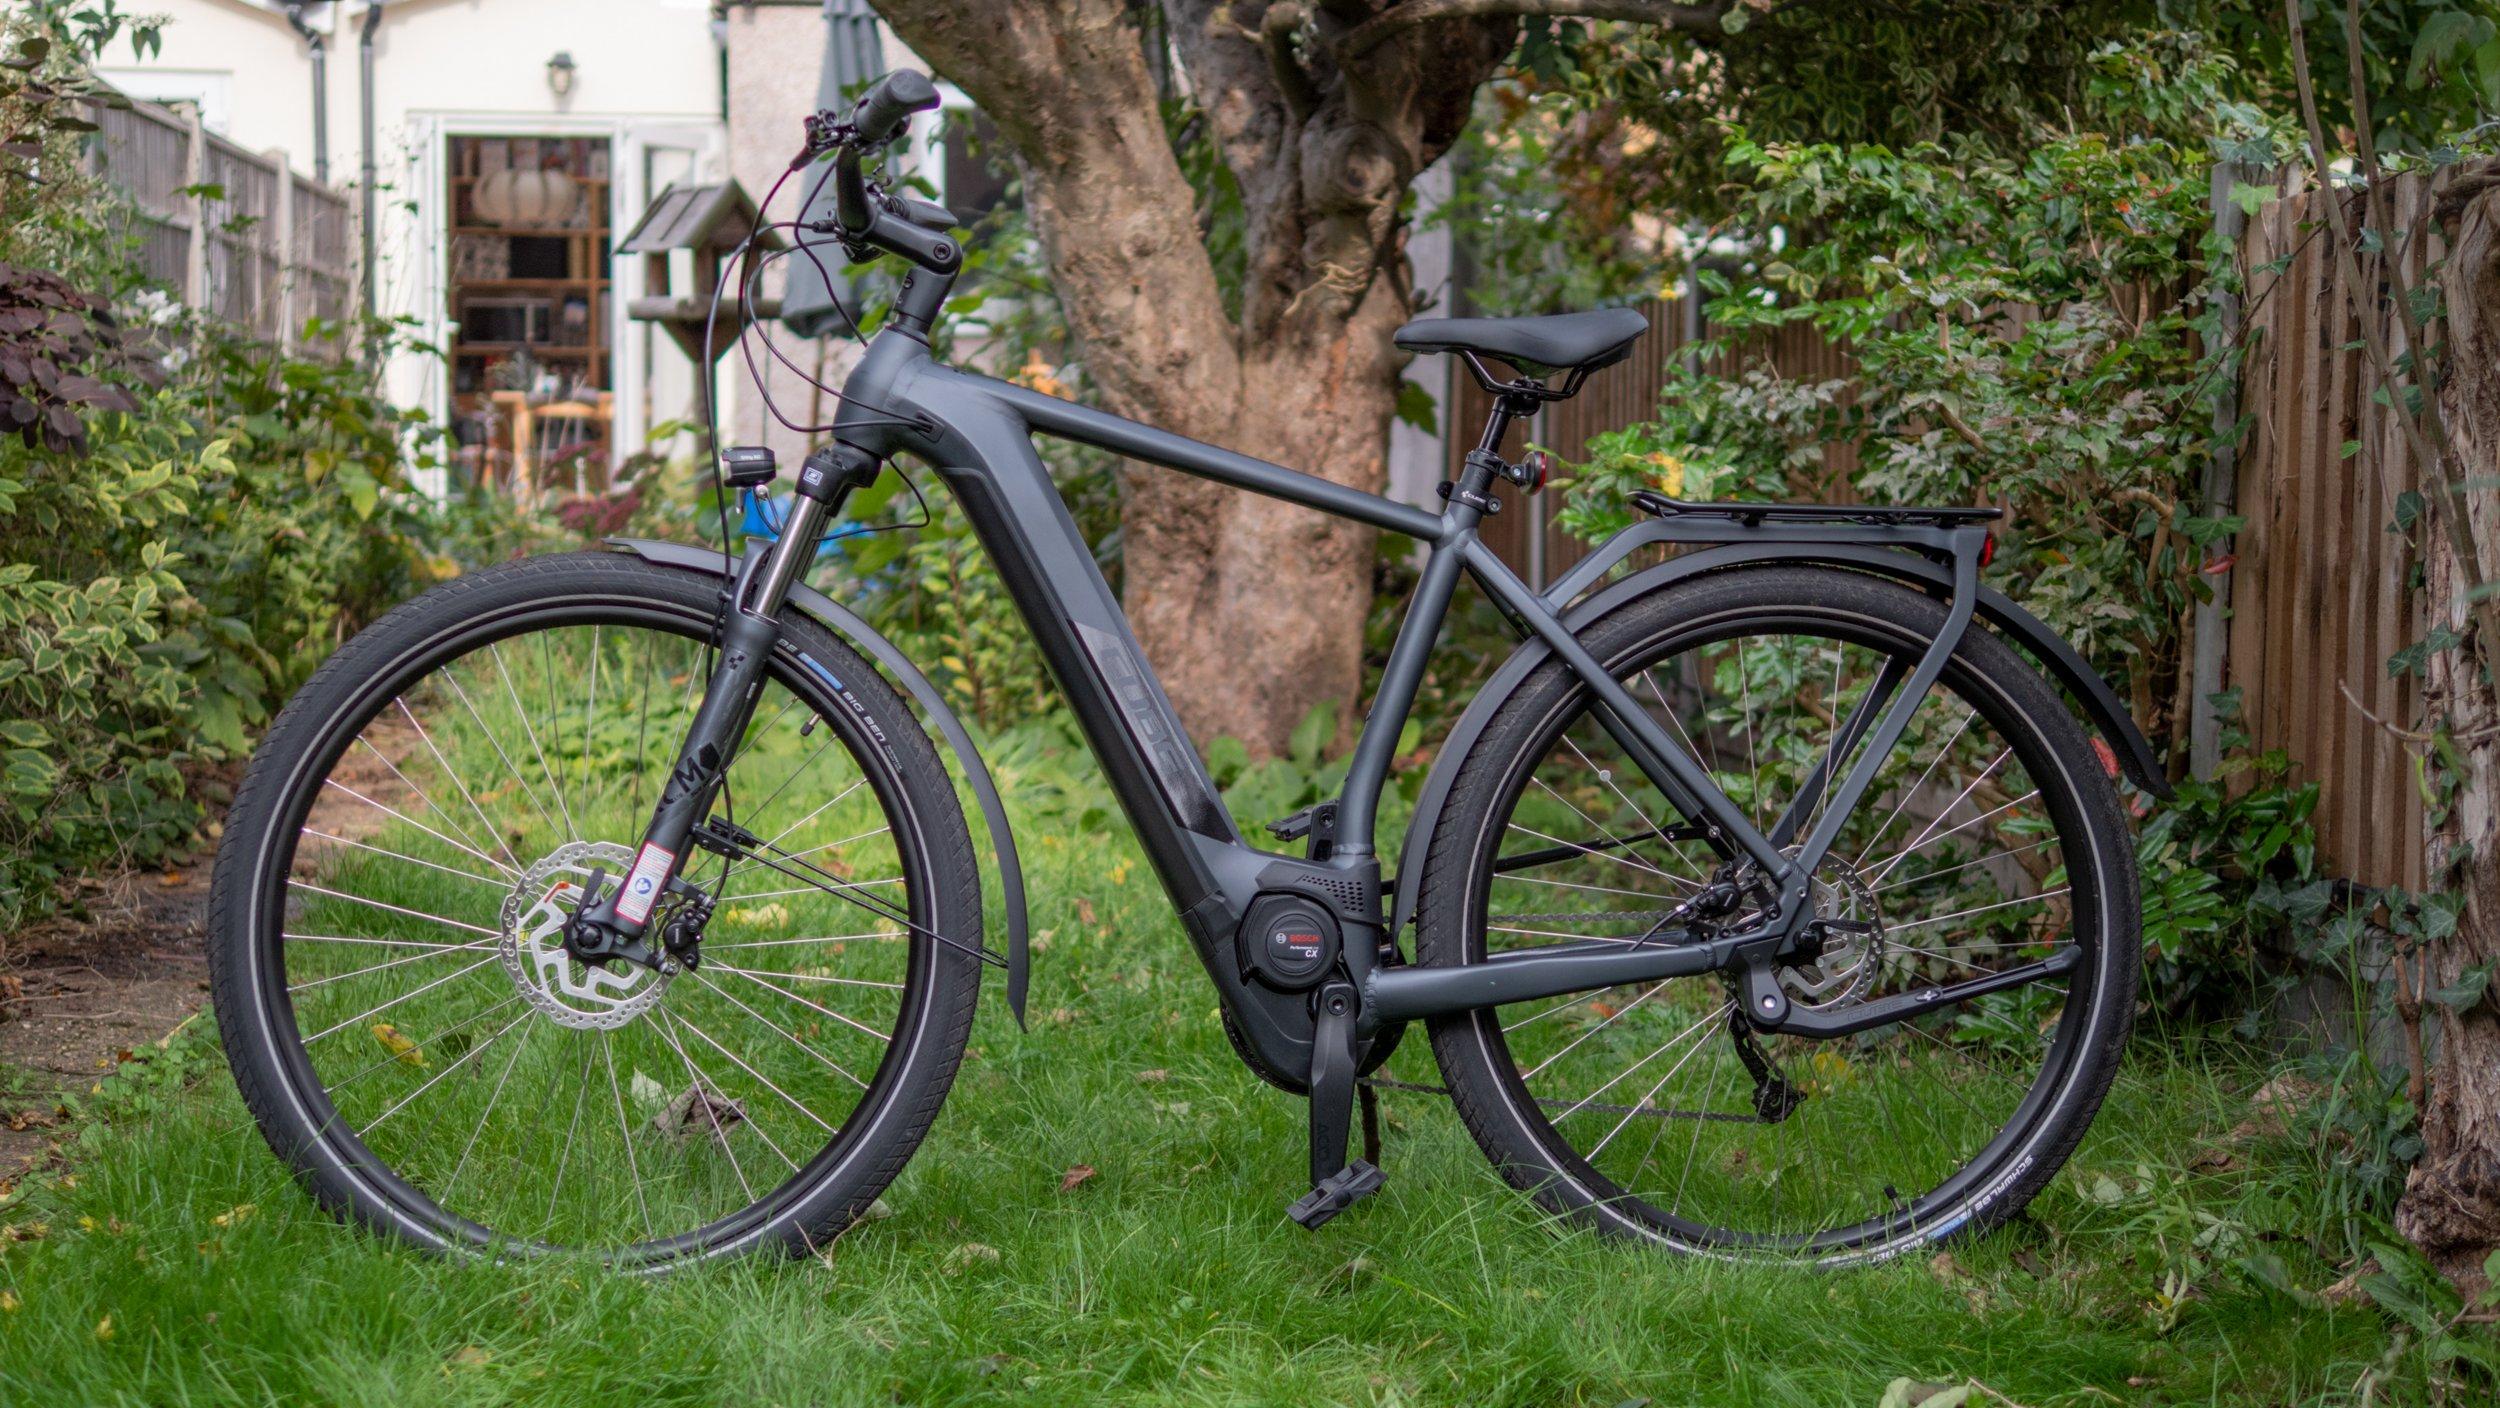 Cube Kathmandu Hybrid One 500 review: The Rolls Royce of e-bikes